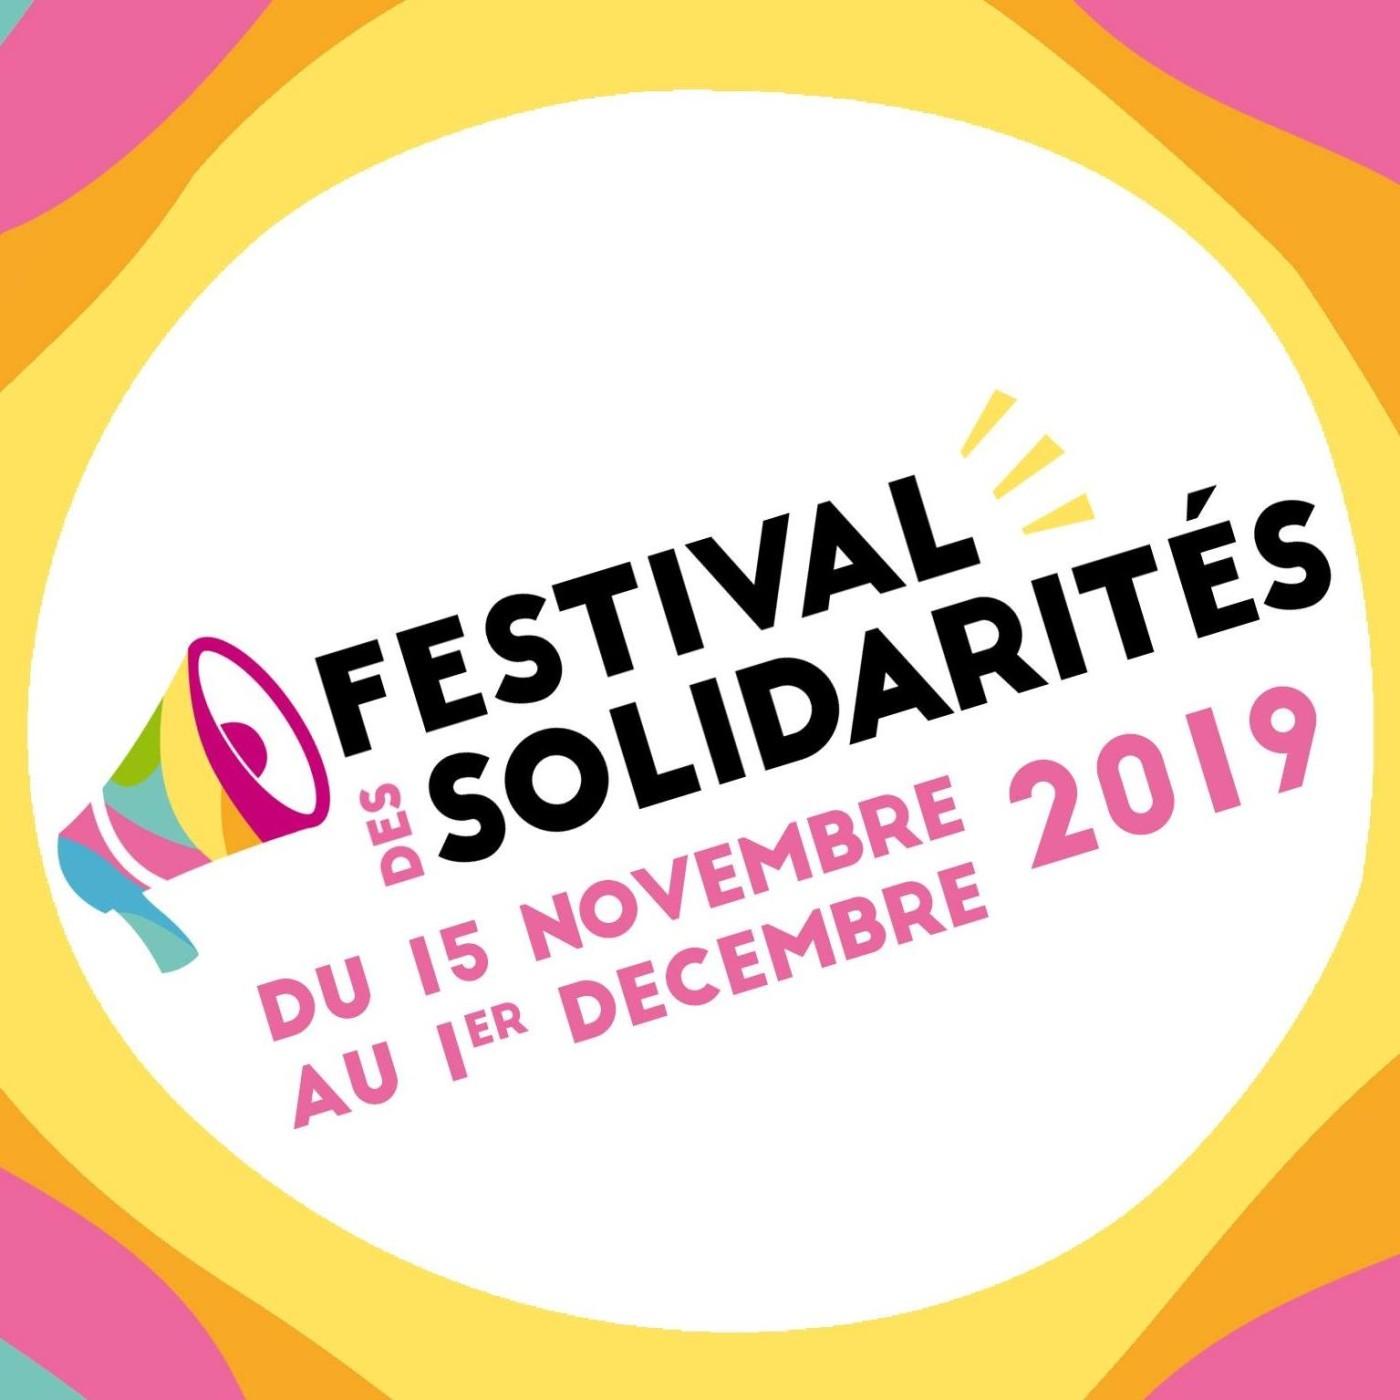 MC aime le Festival des Solidarités (09/11/12)